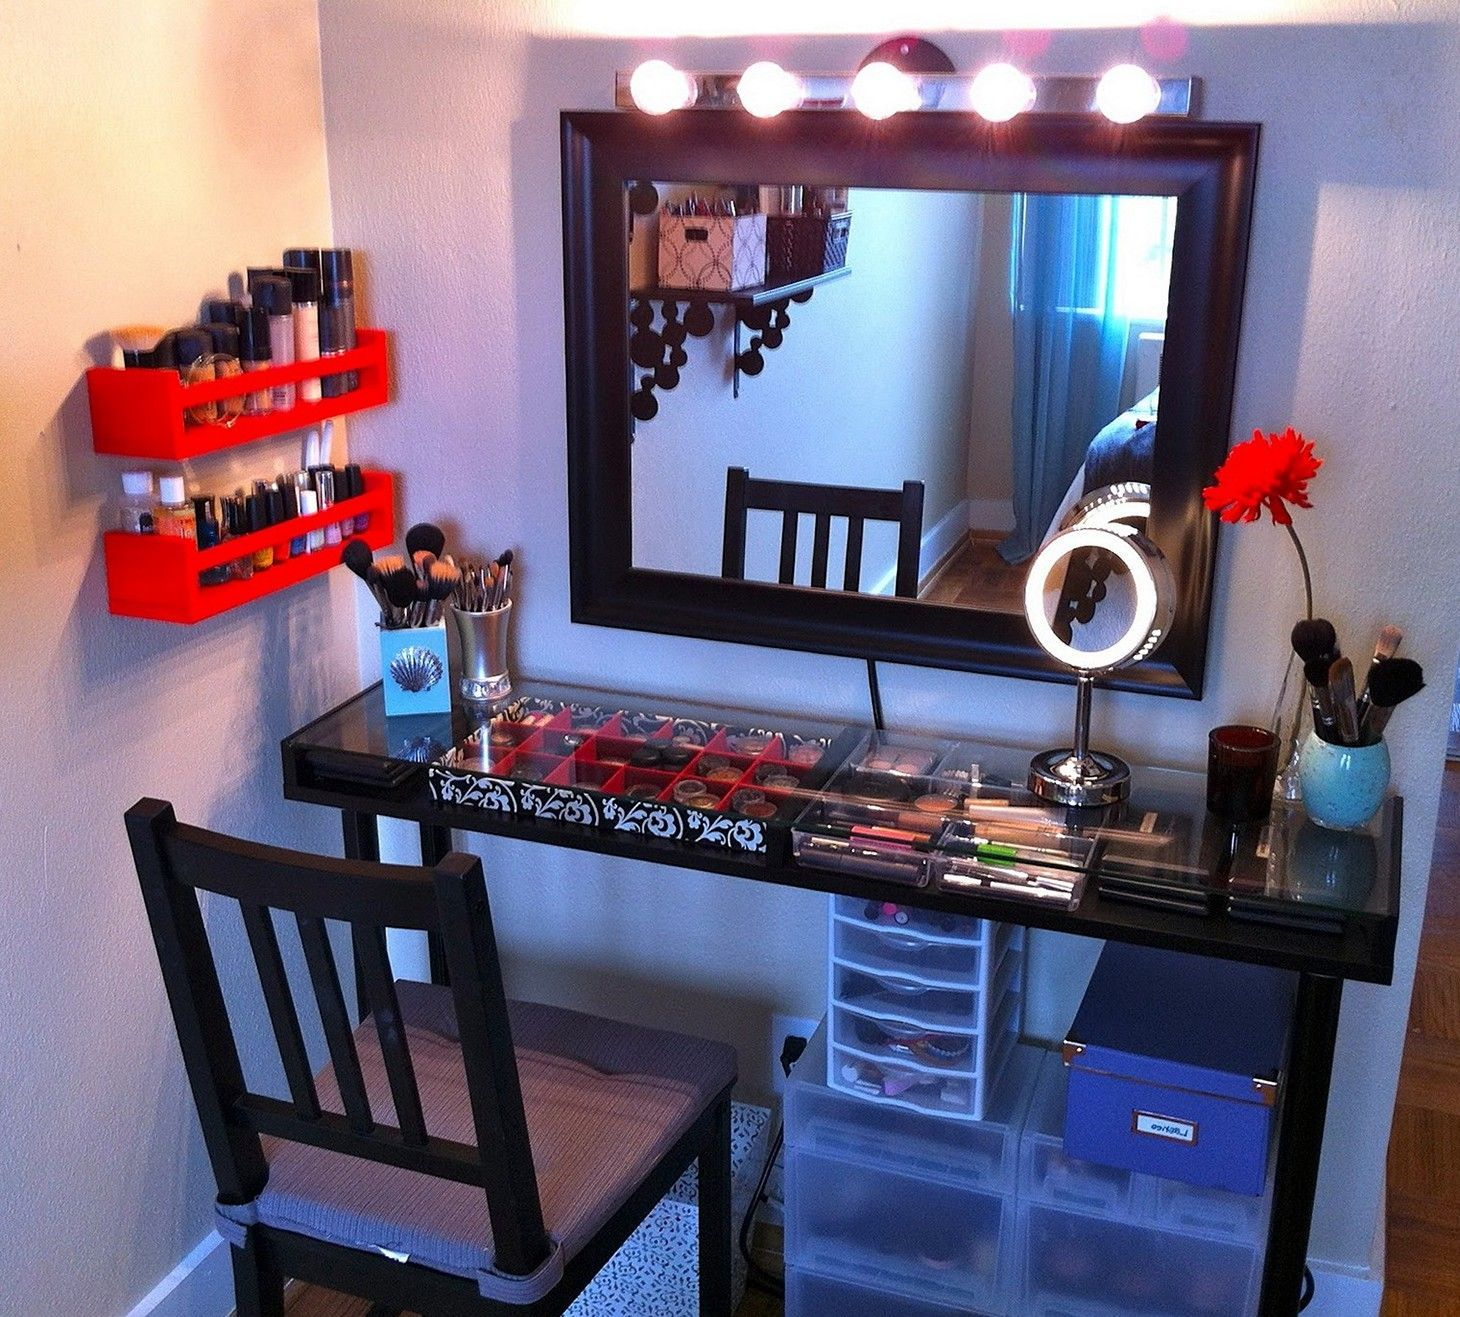 Do you want to make DIY vanity mirror? Try this DIY vanity